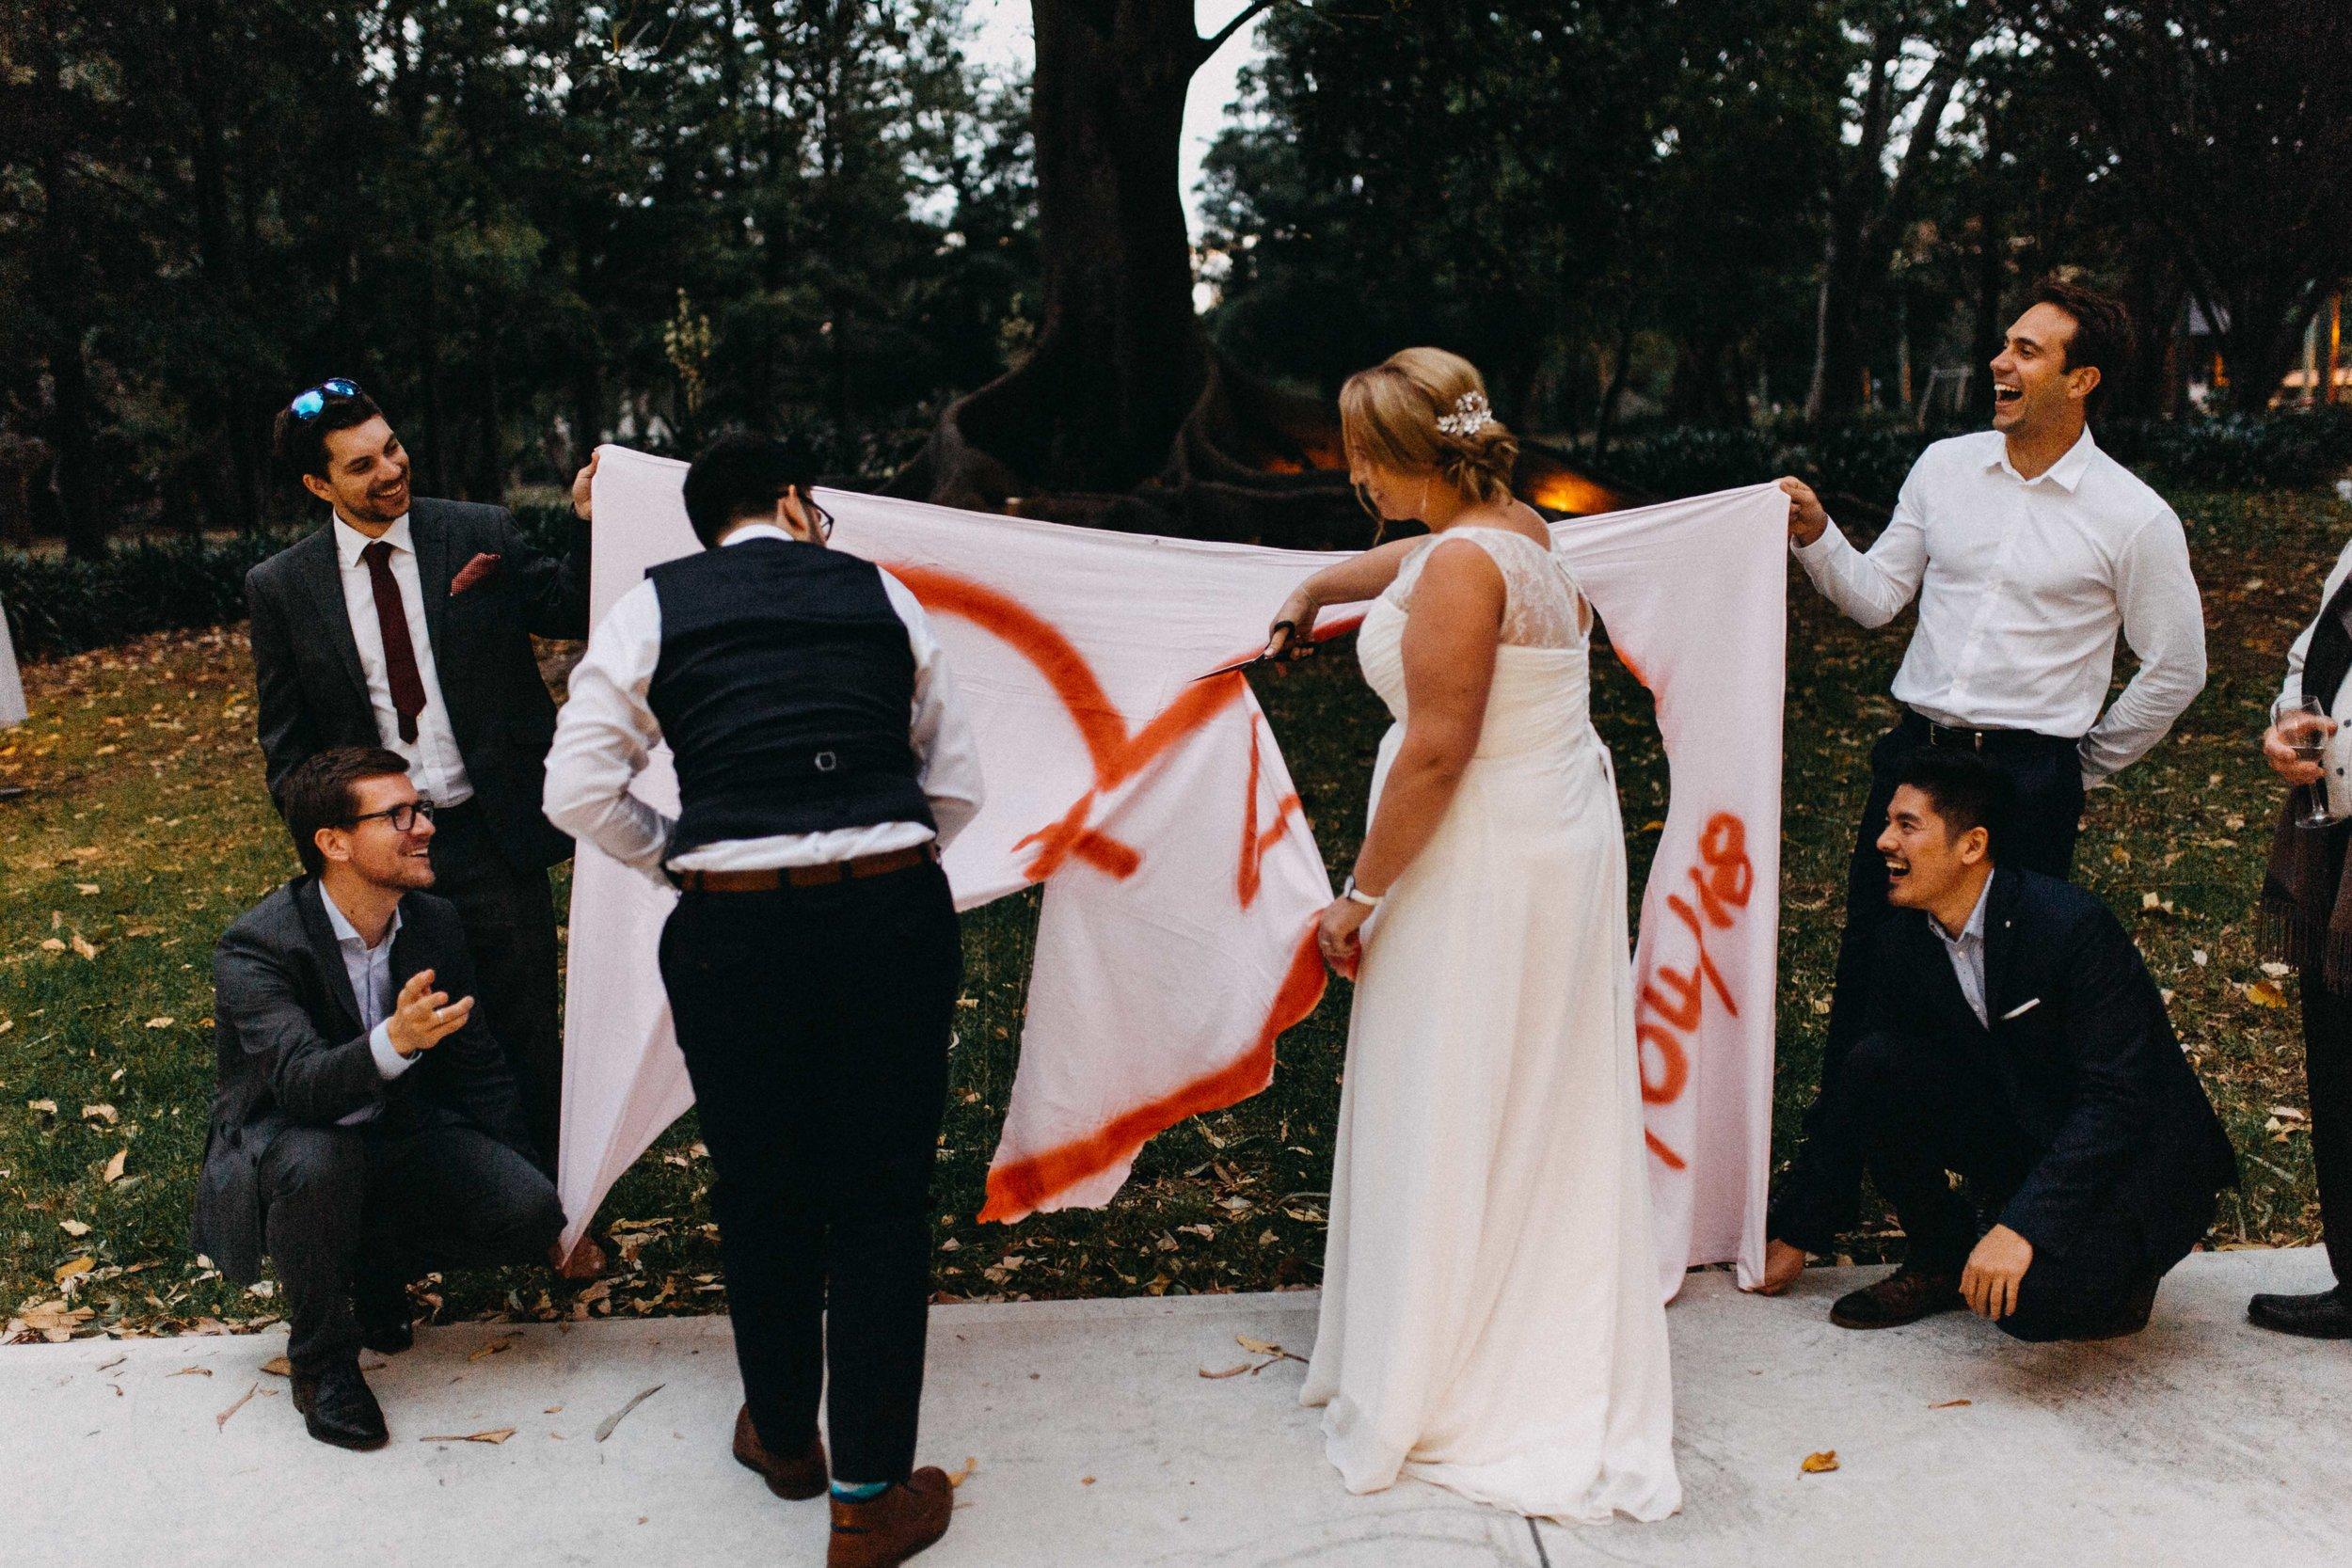 cabarita-park-sydney-wedding-emilyobrienphotography.net-68.jpg